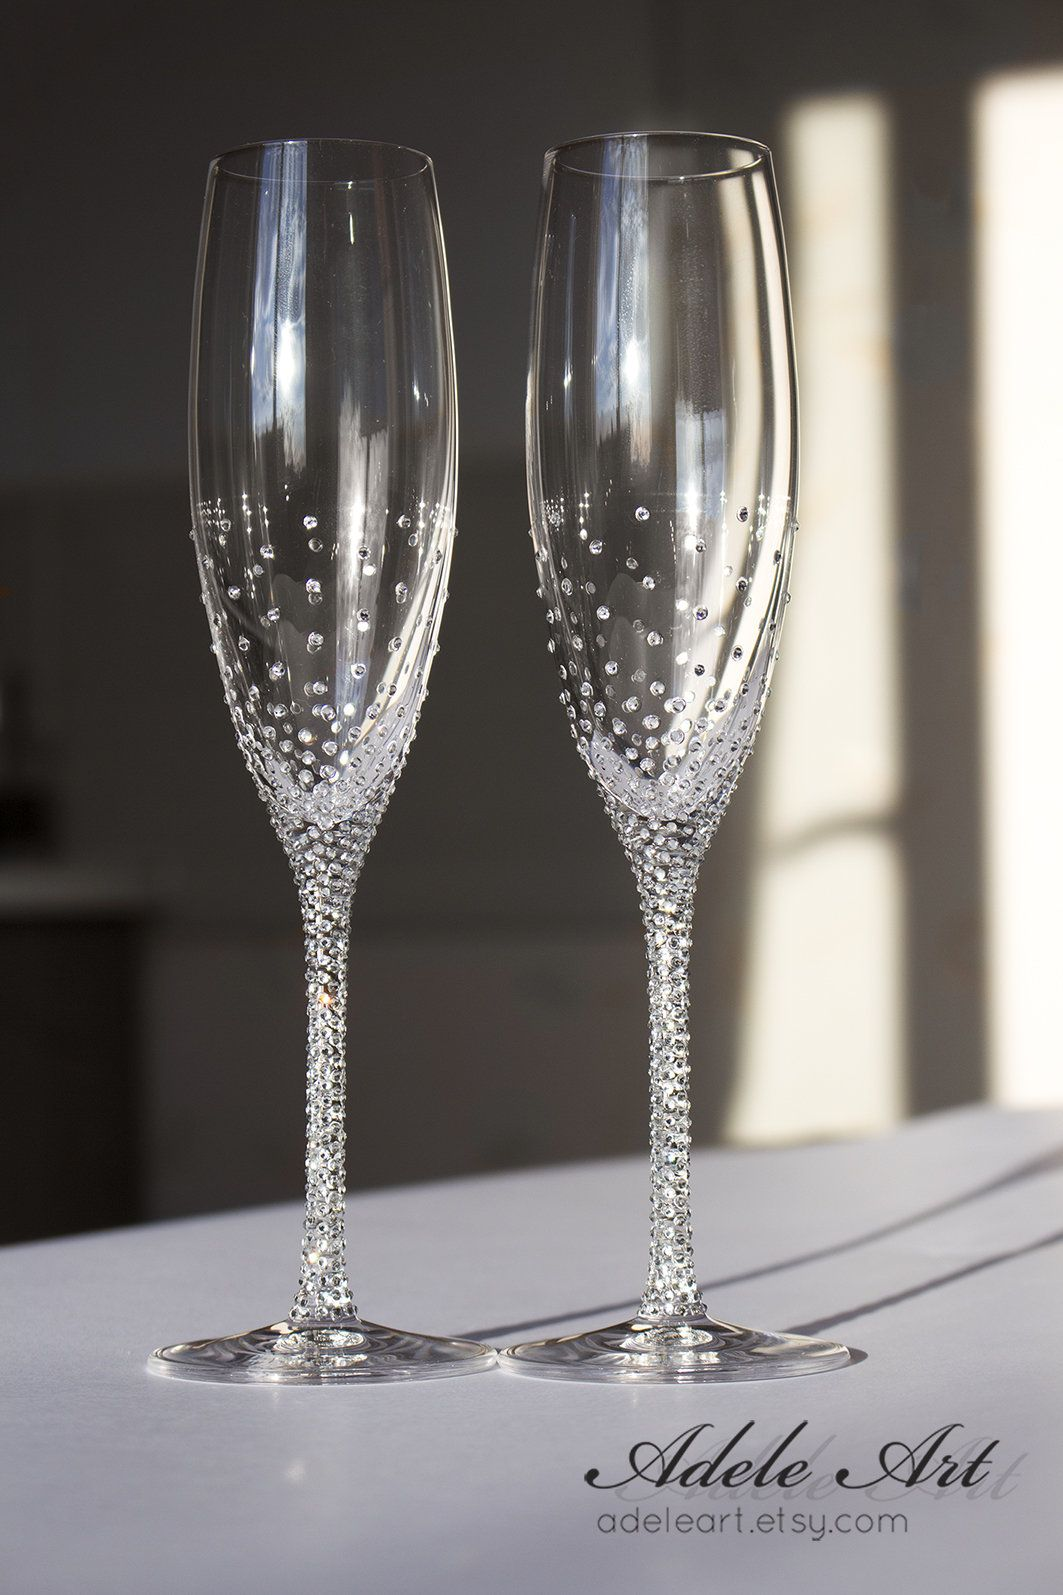 Champagne Wedding Flutes Set Of 2 Wedding Glasses Bride And Etsy Wedding Champagne Glasses Wedding Glasses Wedding Champagne Flutes